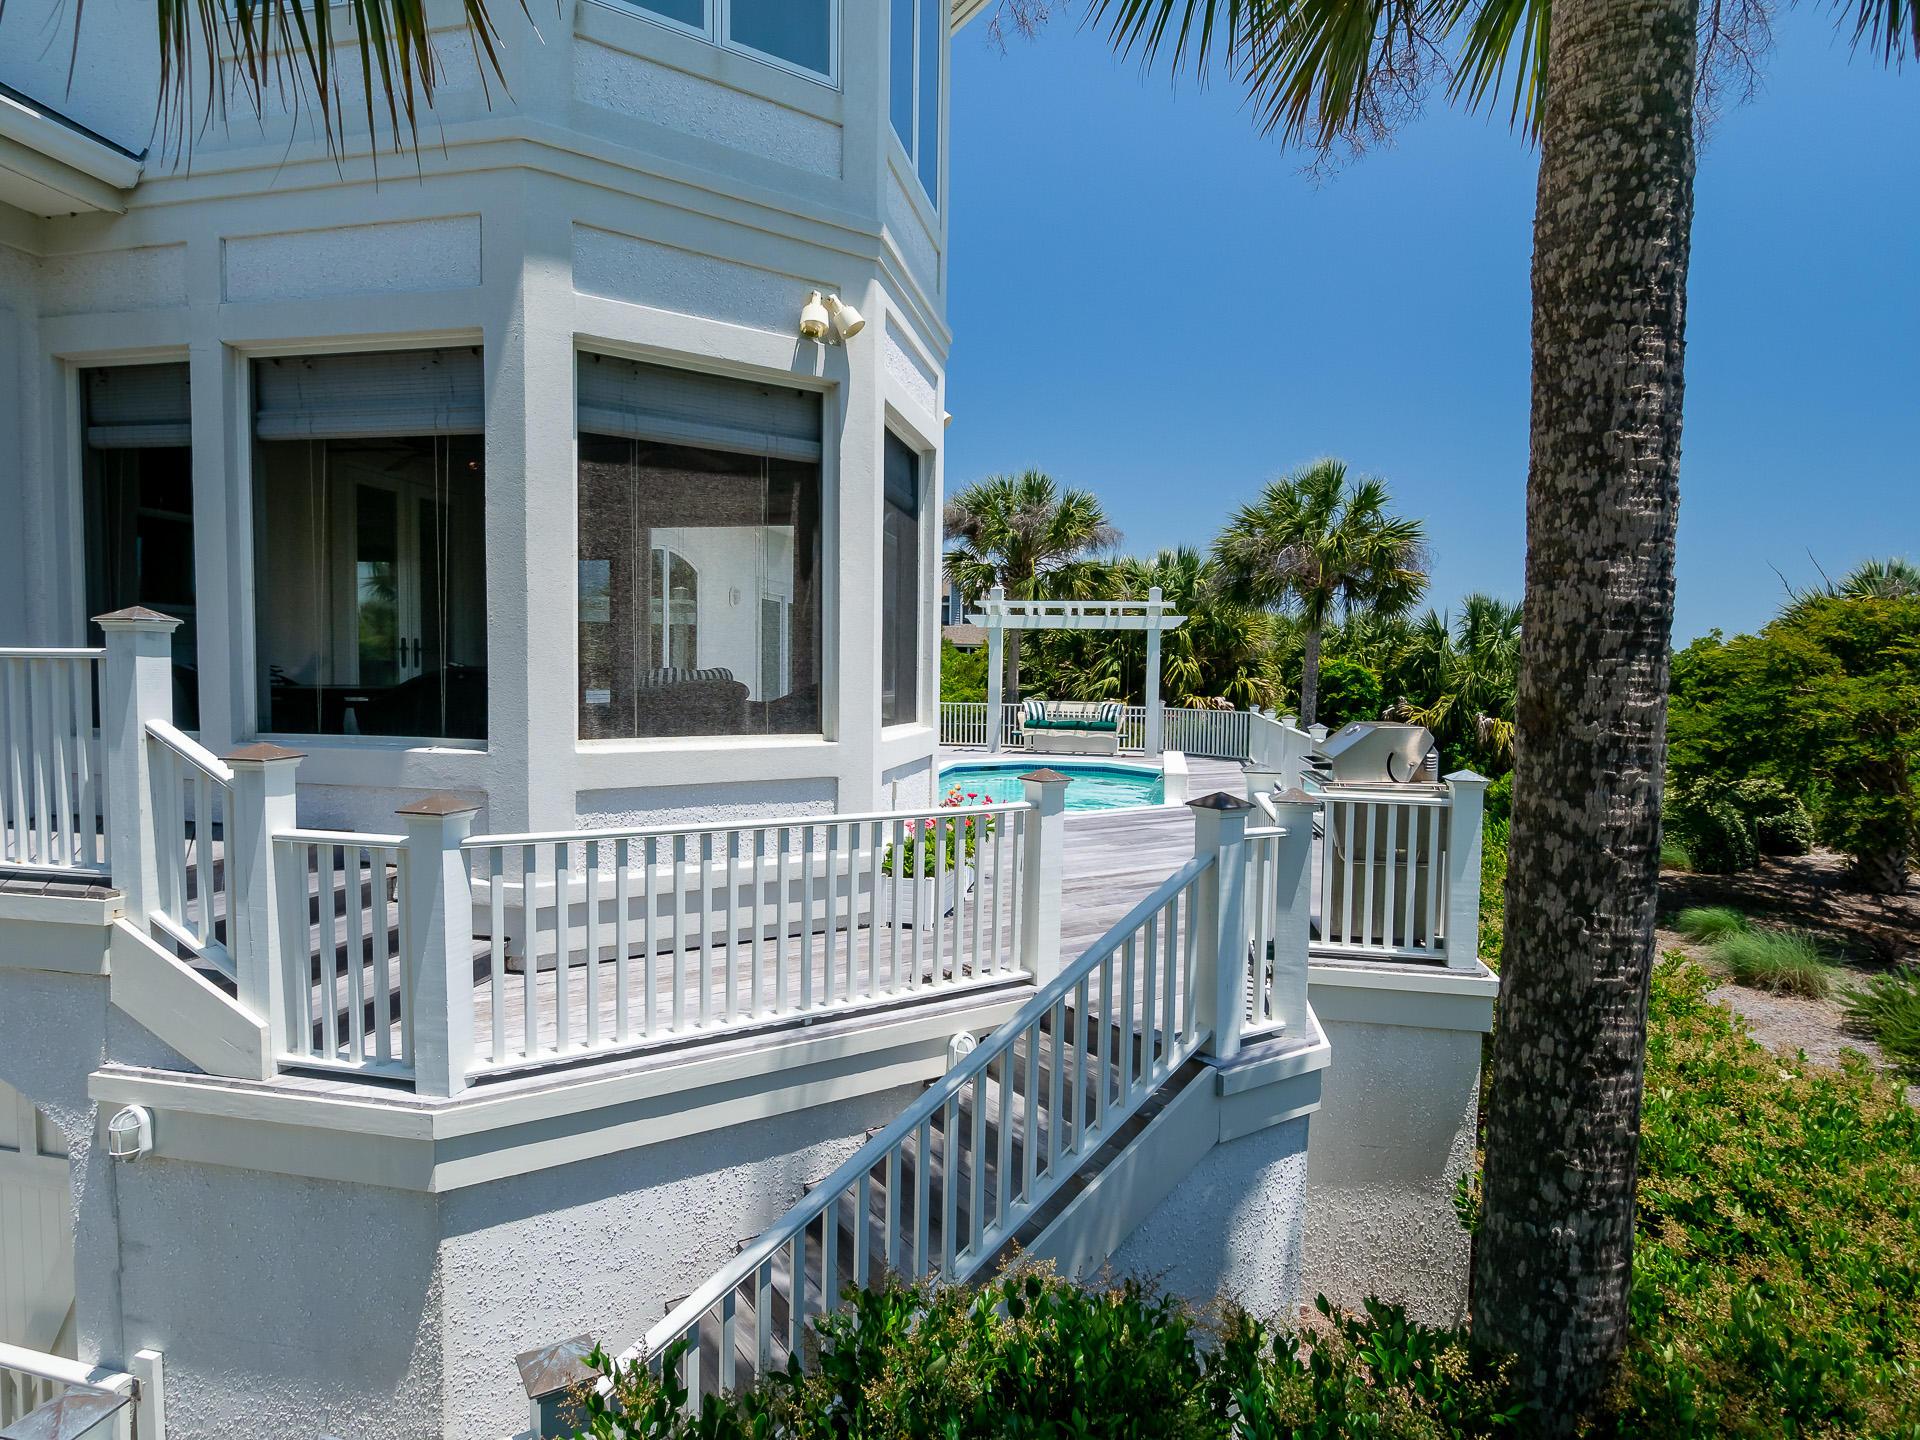 Seabrook Island Homes For Sale - 2216 Rolling Dune, Seabrook Island, SC - 58